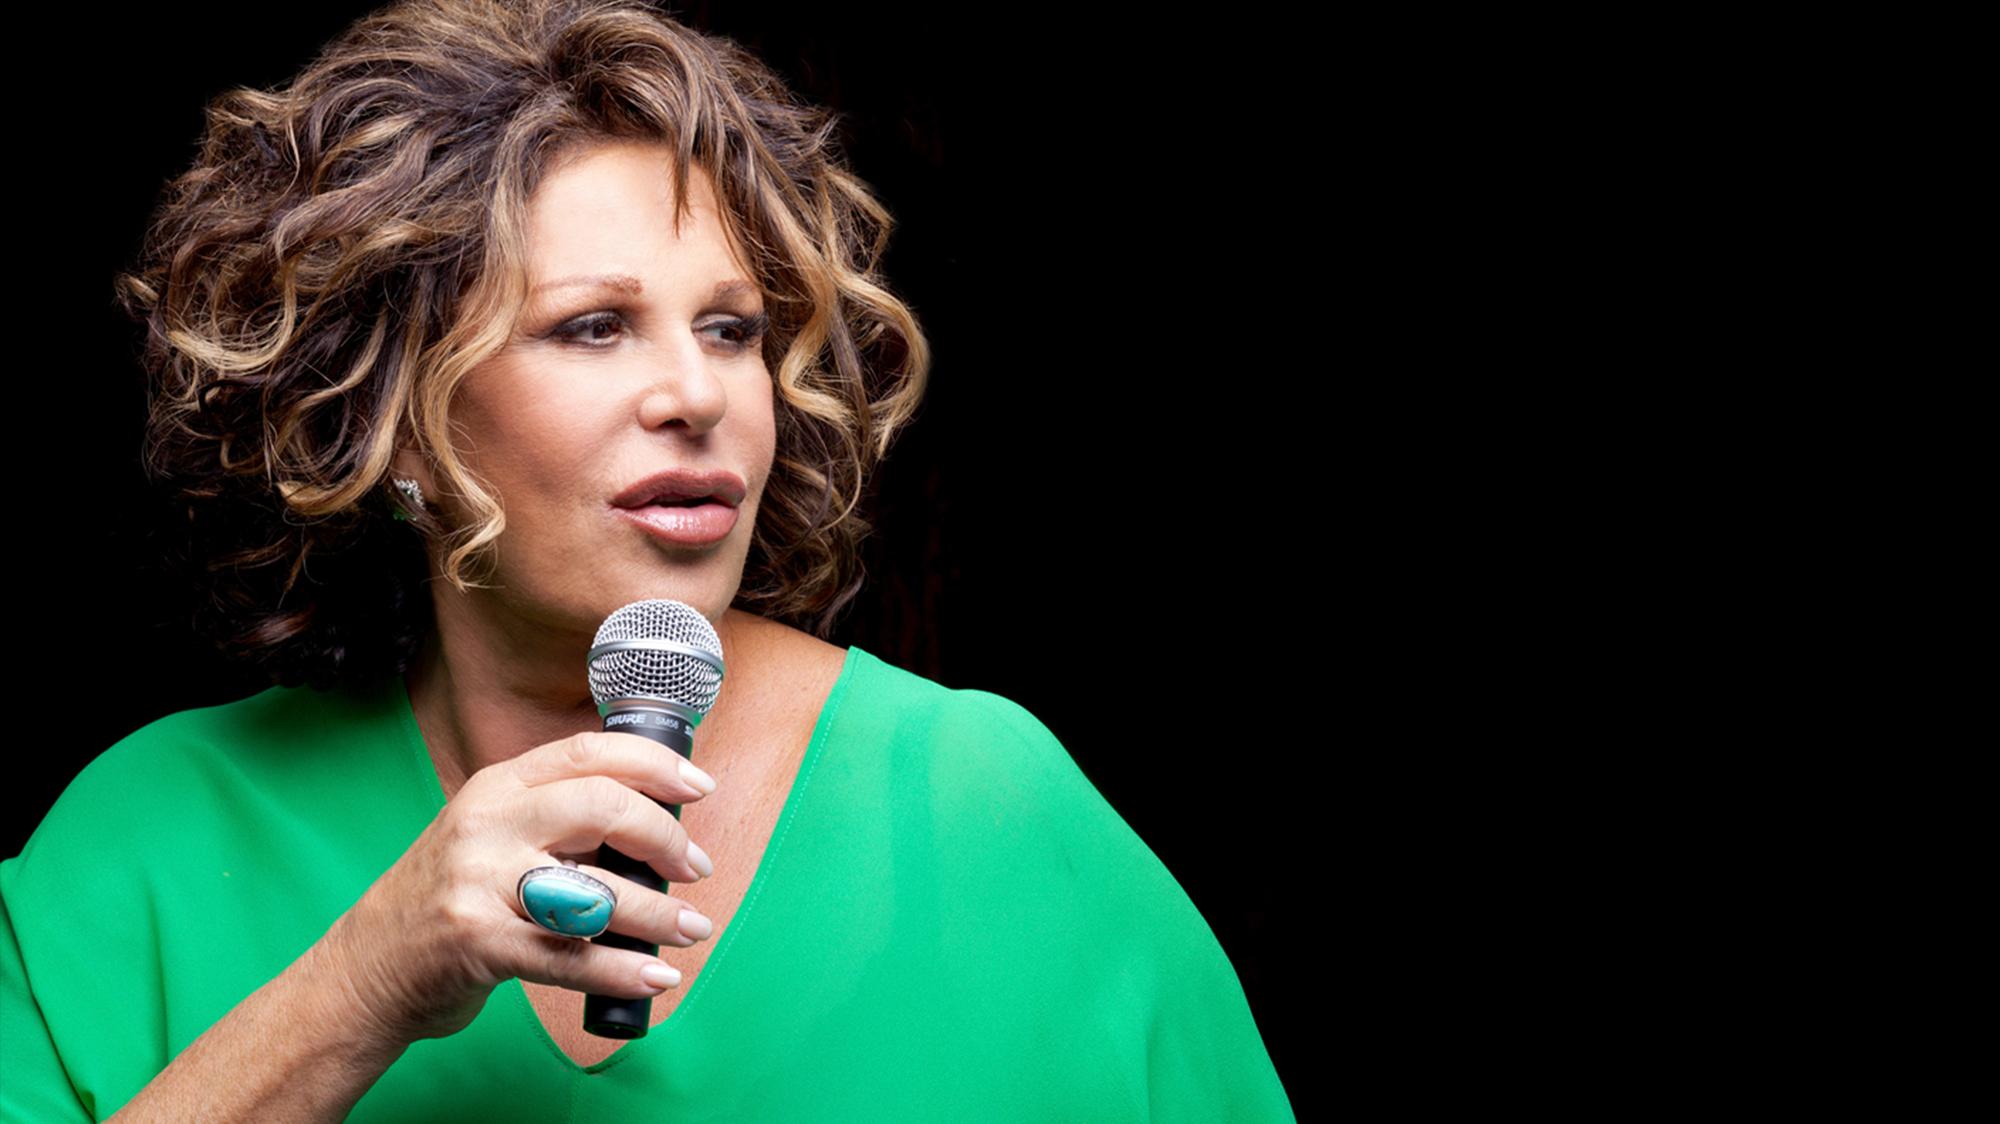 Lainie Kazan, the Oscar-Nominated Singer